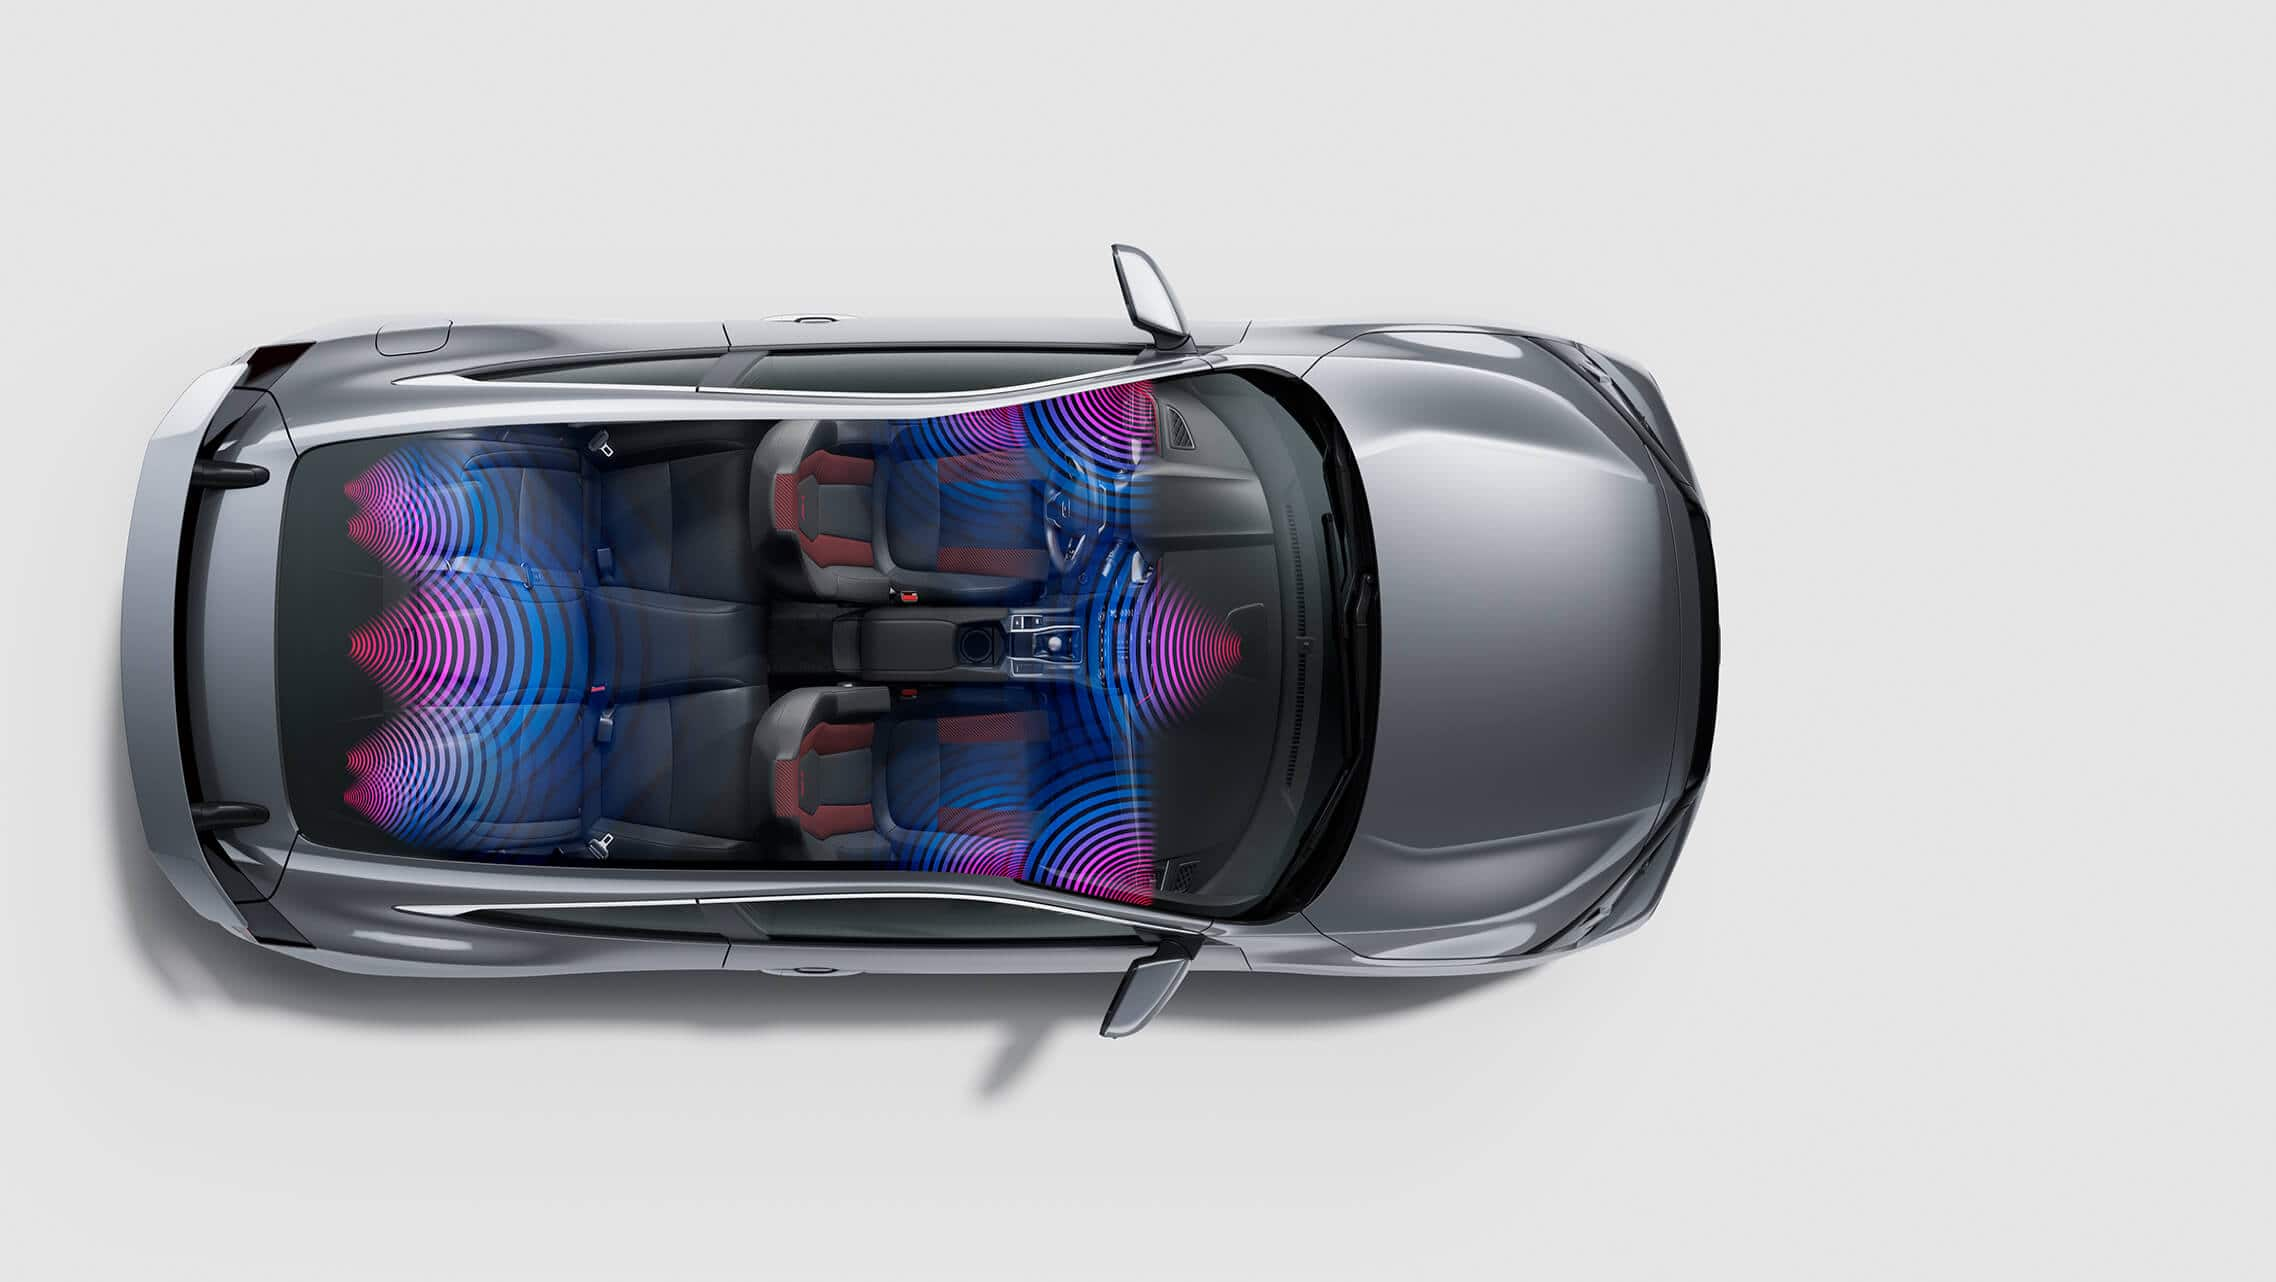 Vista aérea del Honda Civic Si Coupé2020 en Modern Steel Metallic con gráficos de sonido envolvente.